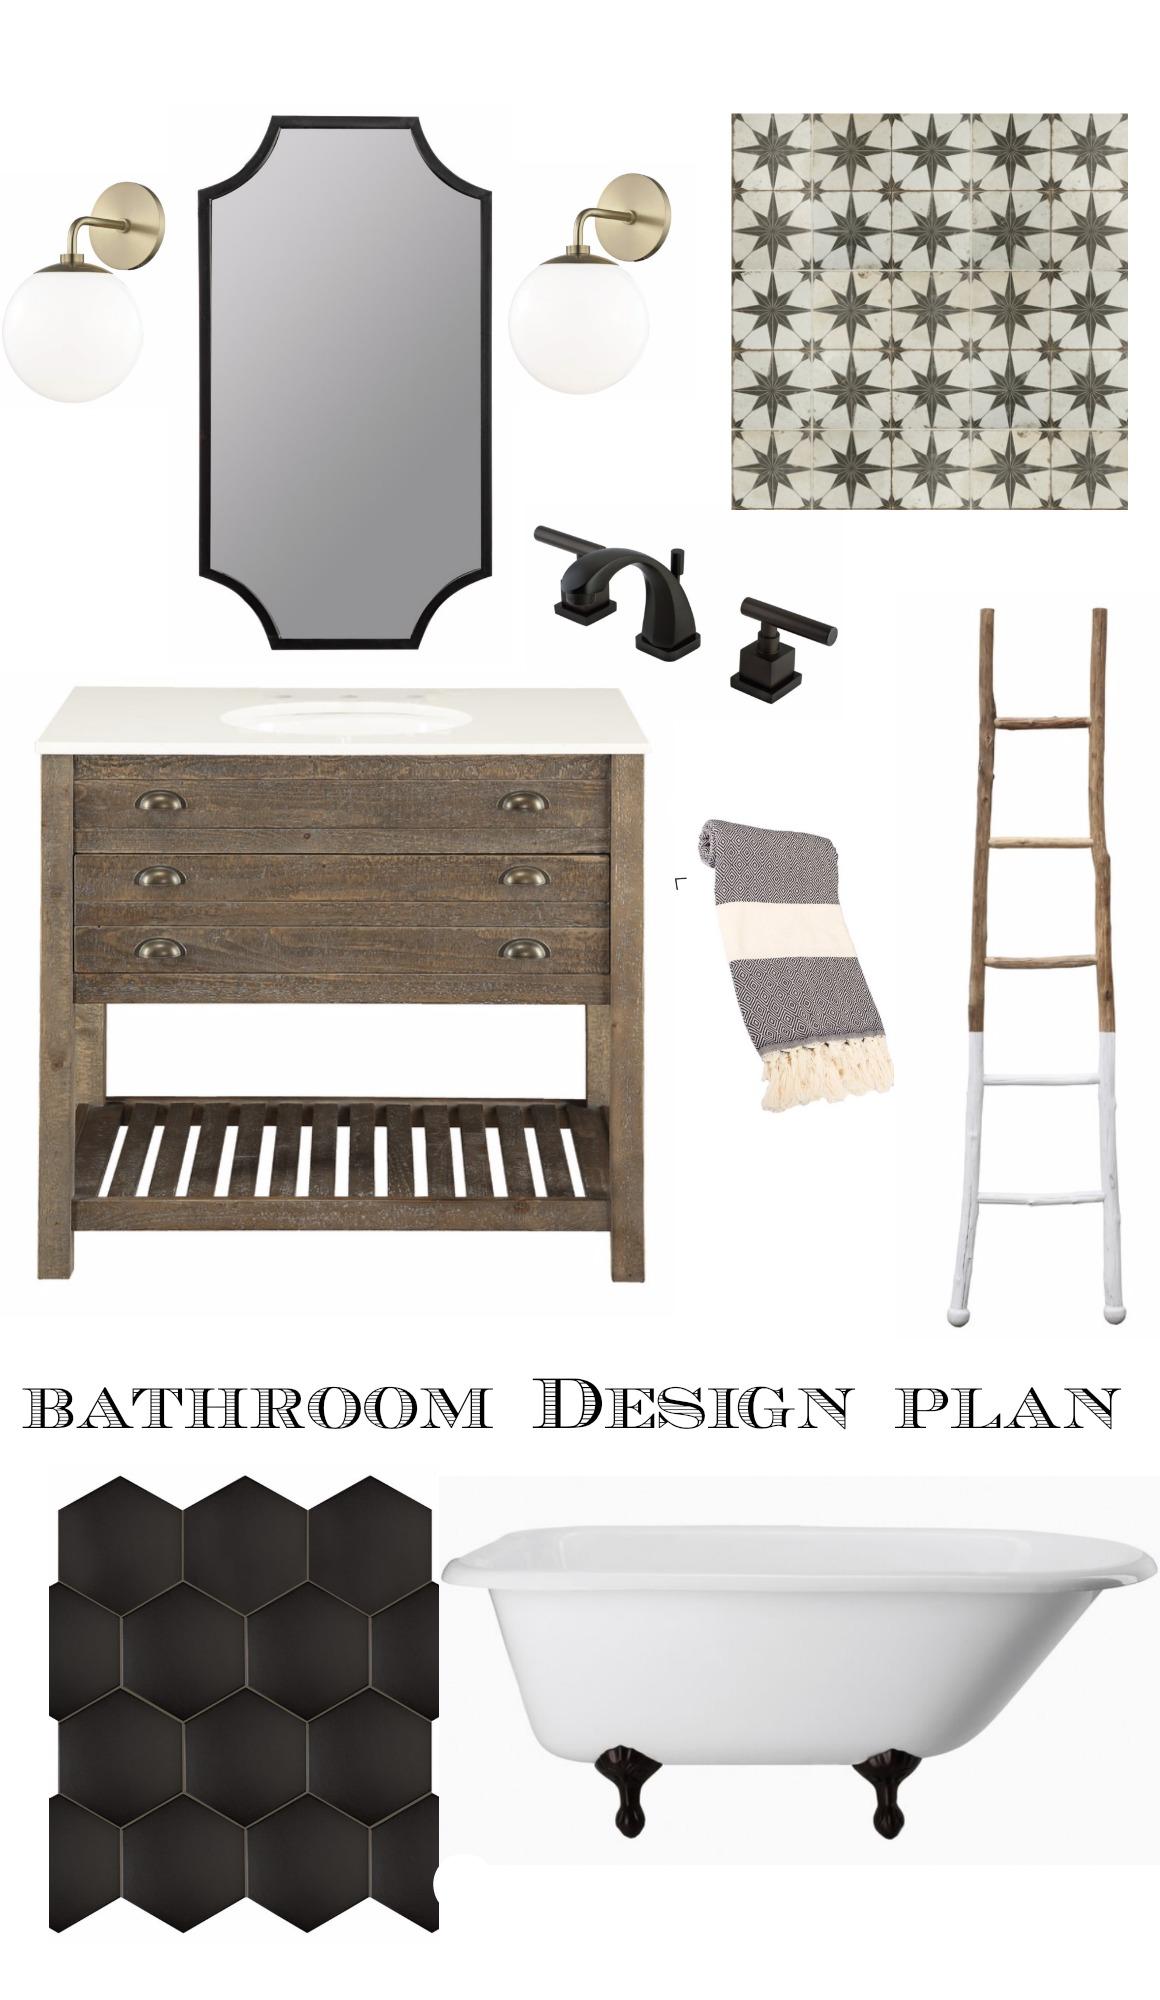 Bathroom Inspiration to Plan